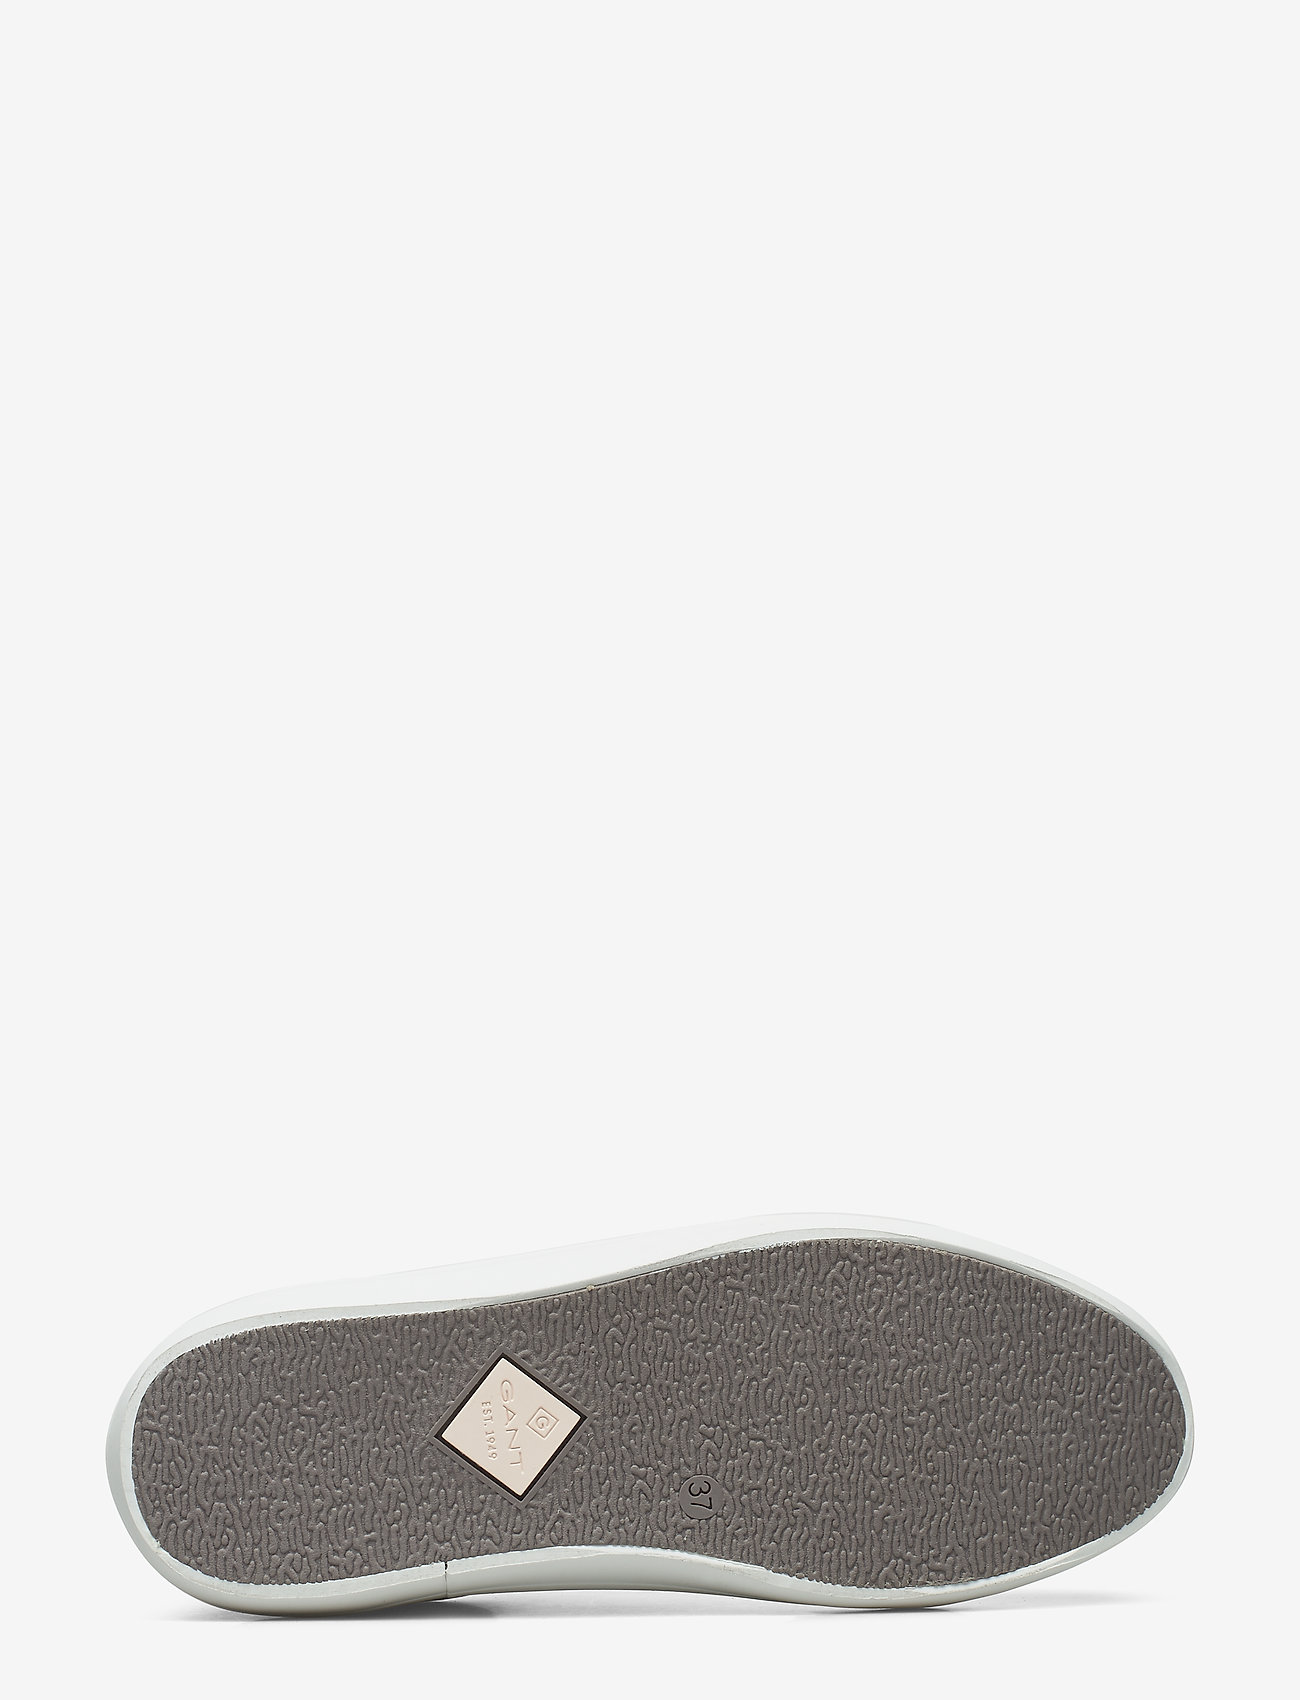 Seaville Sneaker (Bright Wht./silver) - GANT